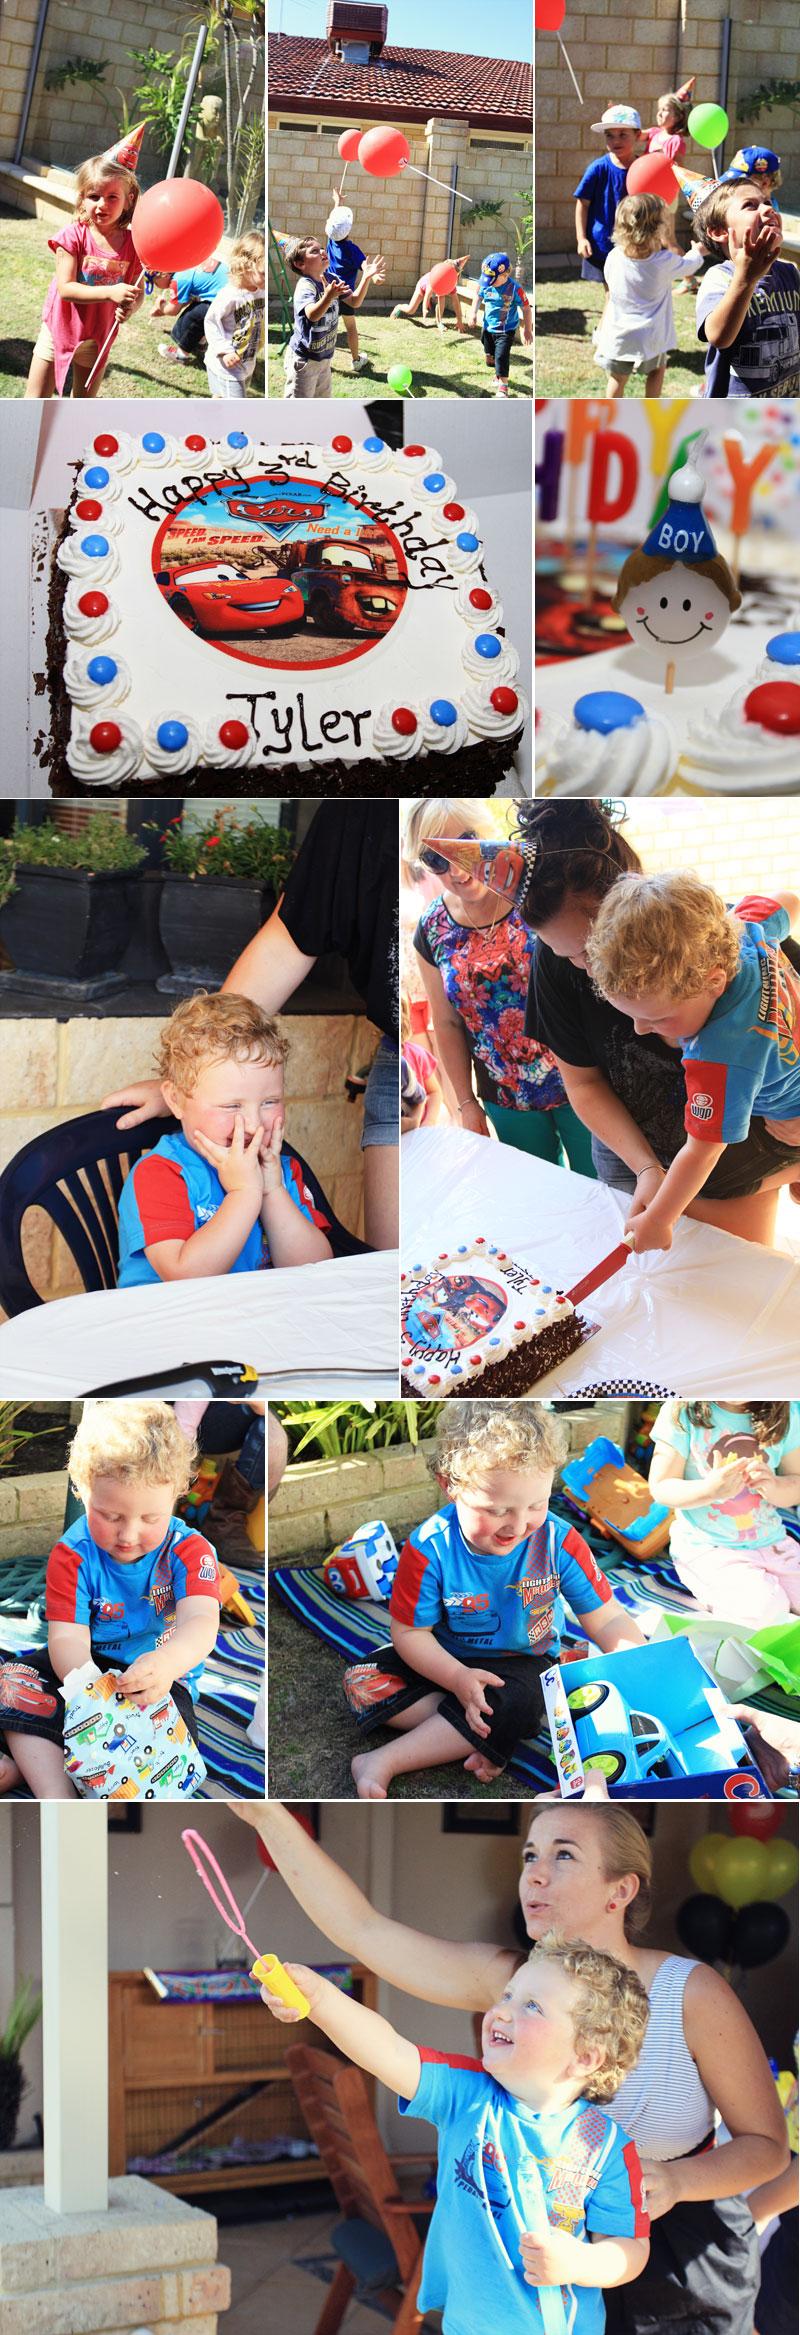 Tylers-3rd-Birthday05